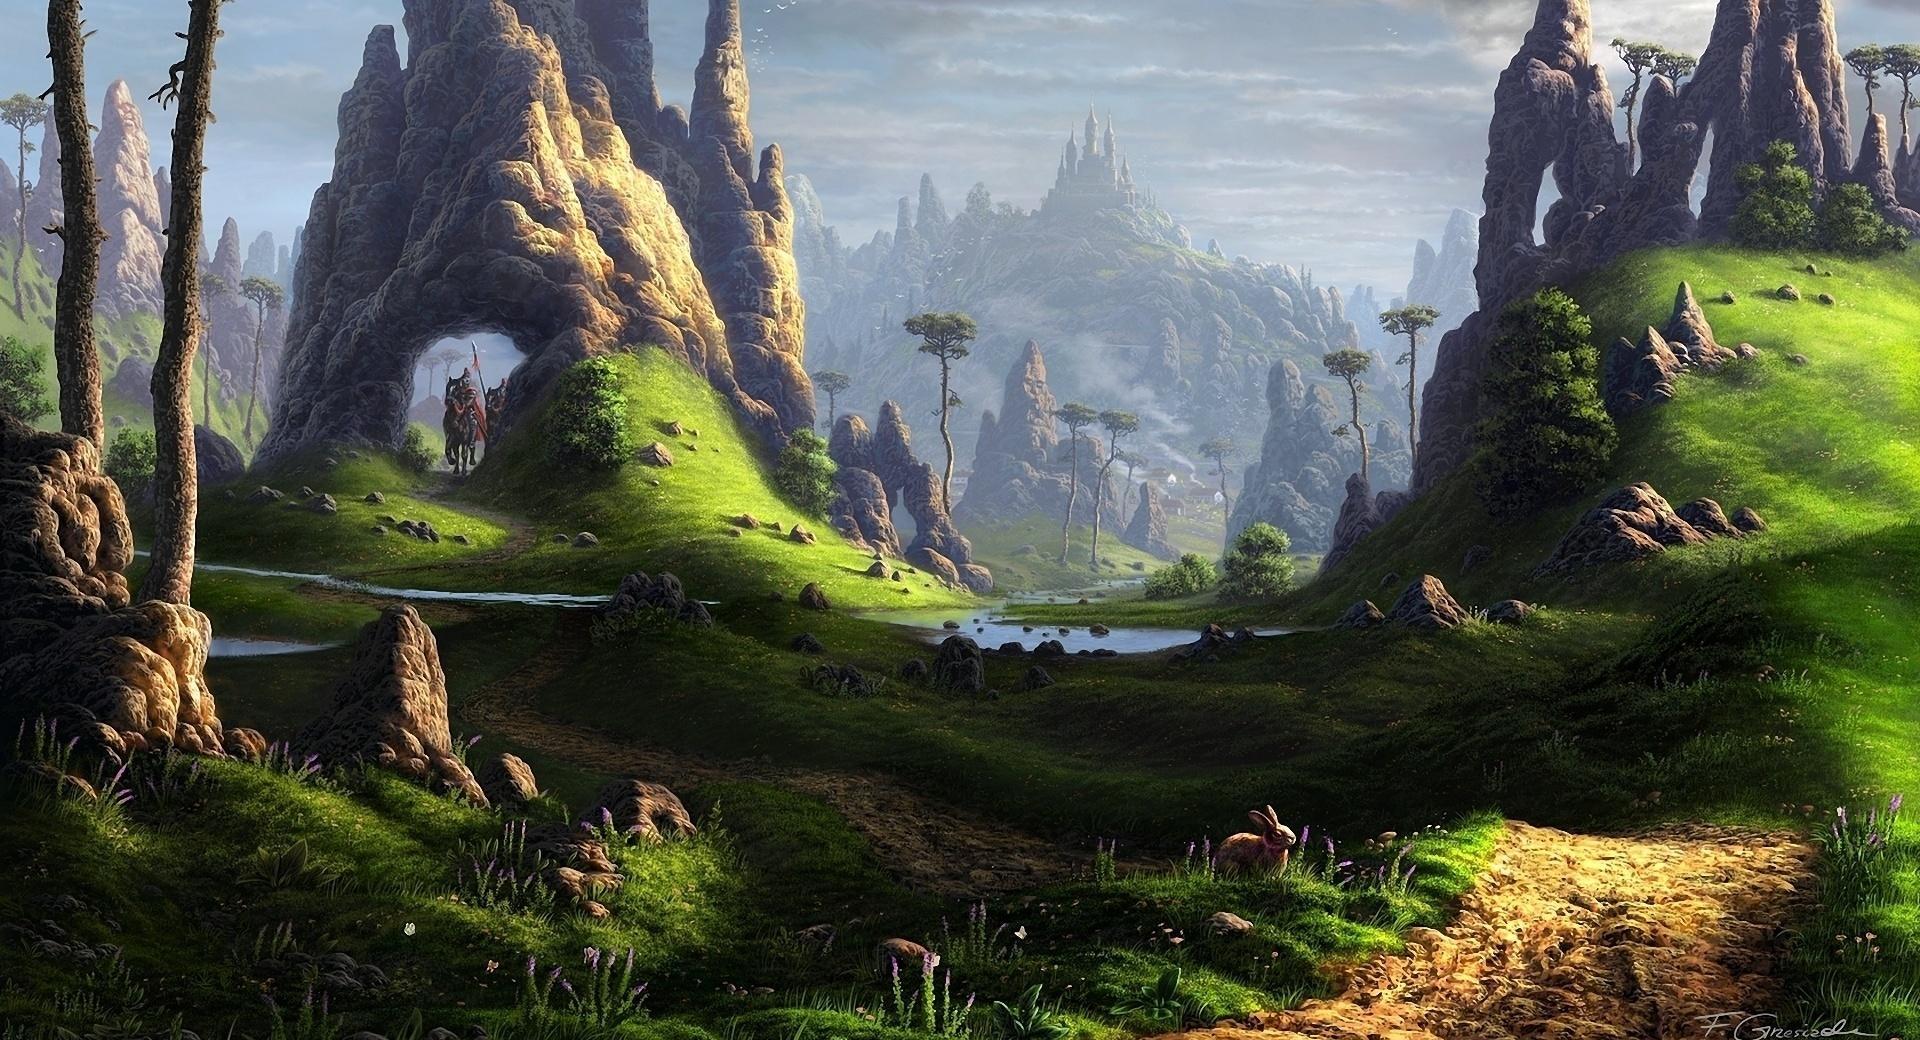 Fantastic Landscape wallpapers HD quality